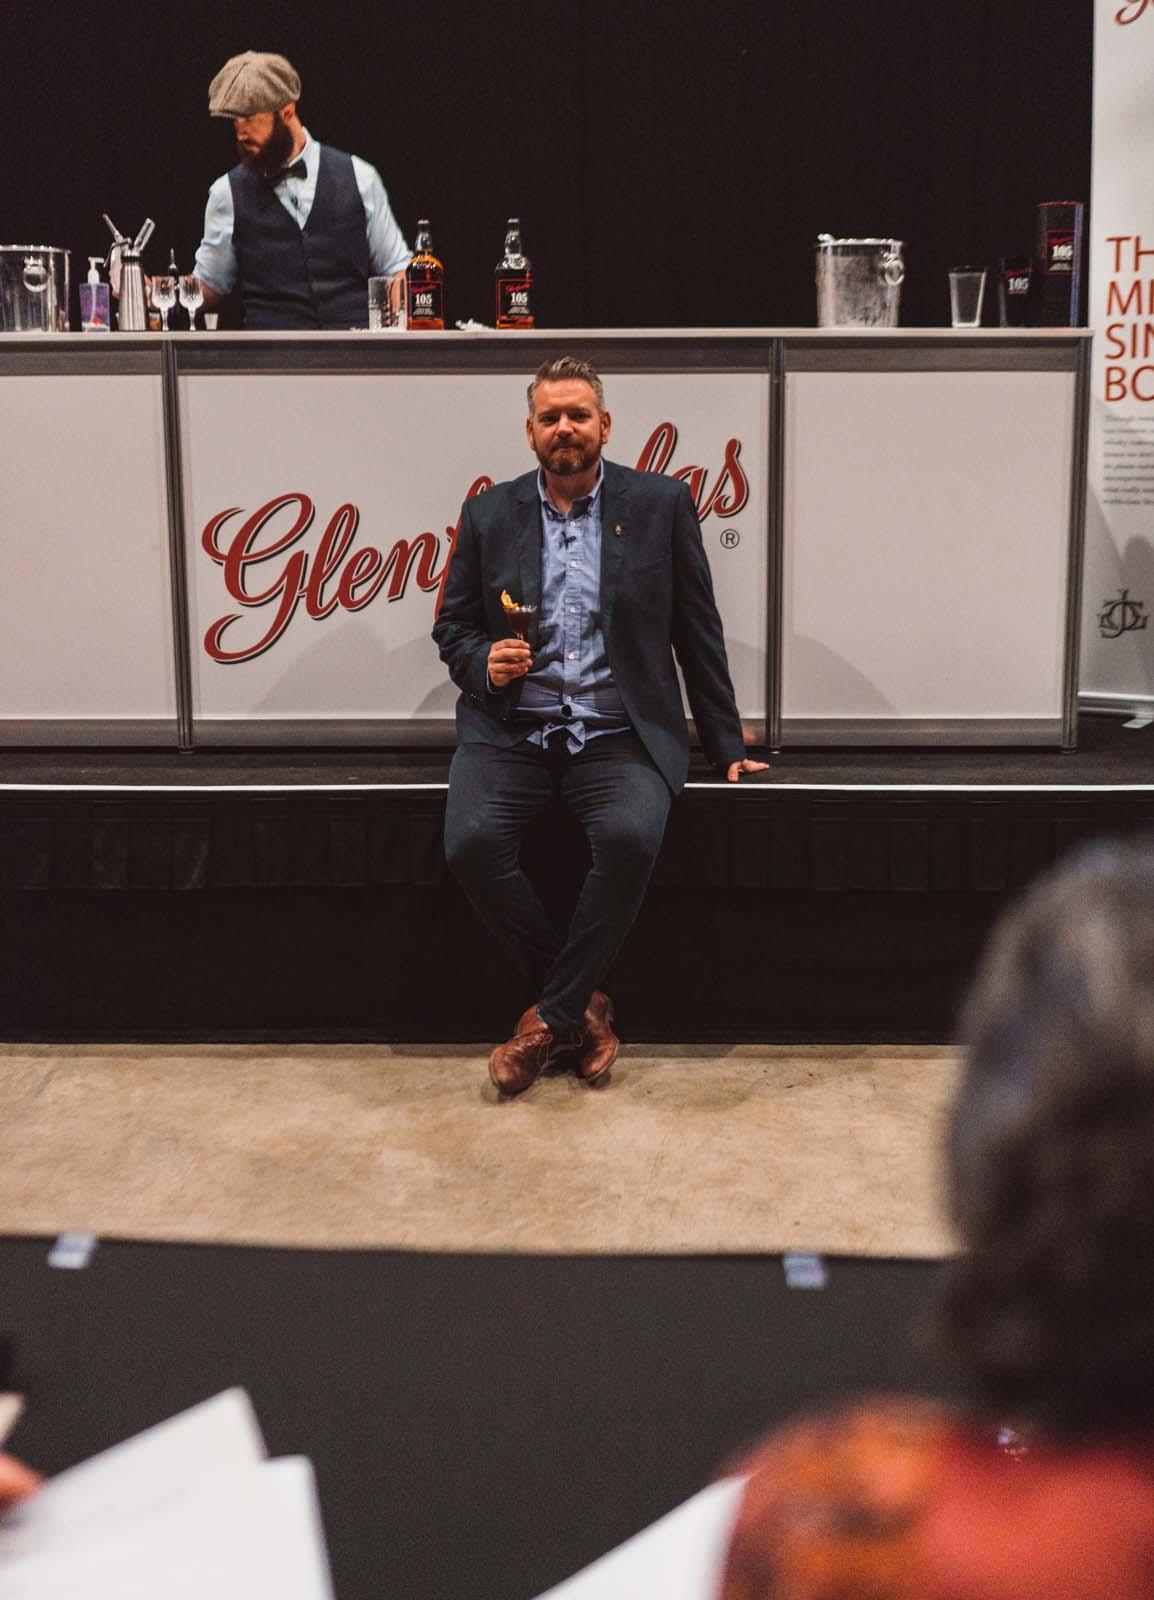 Dramfest 2018 for Whisky Galore-366.jpg